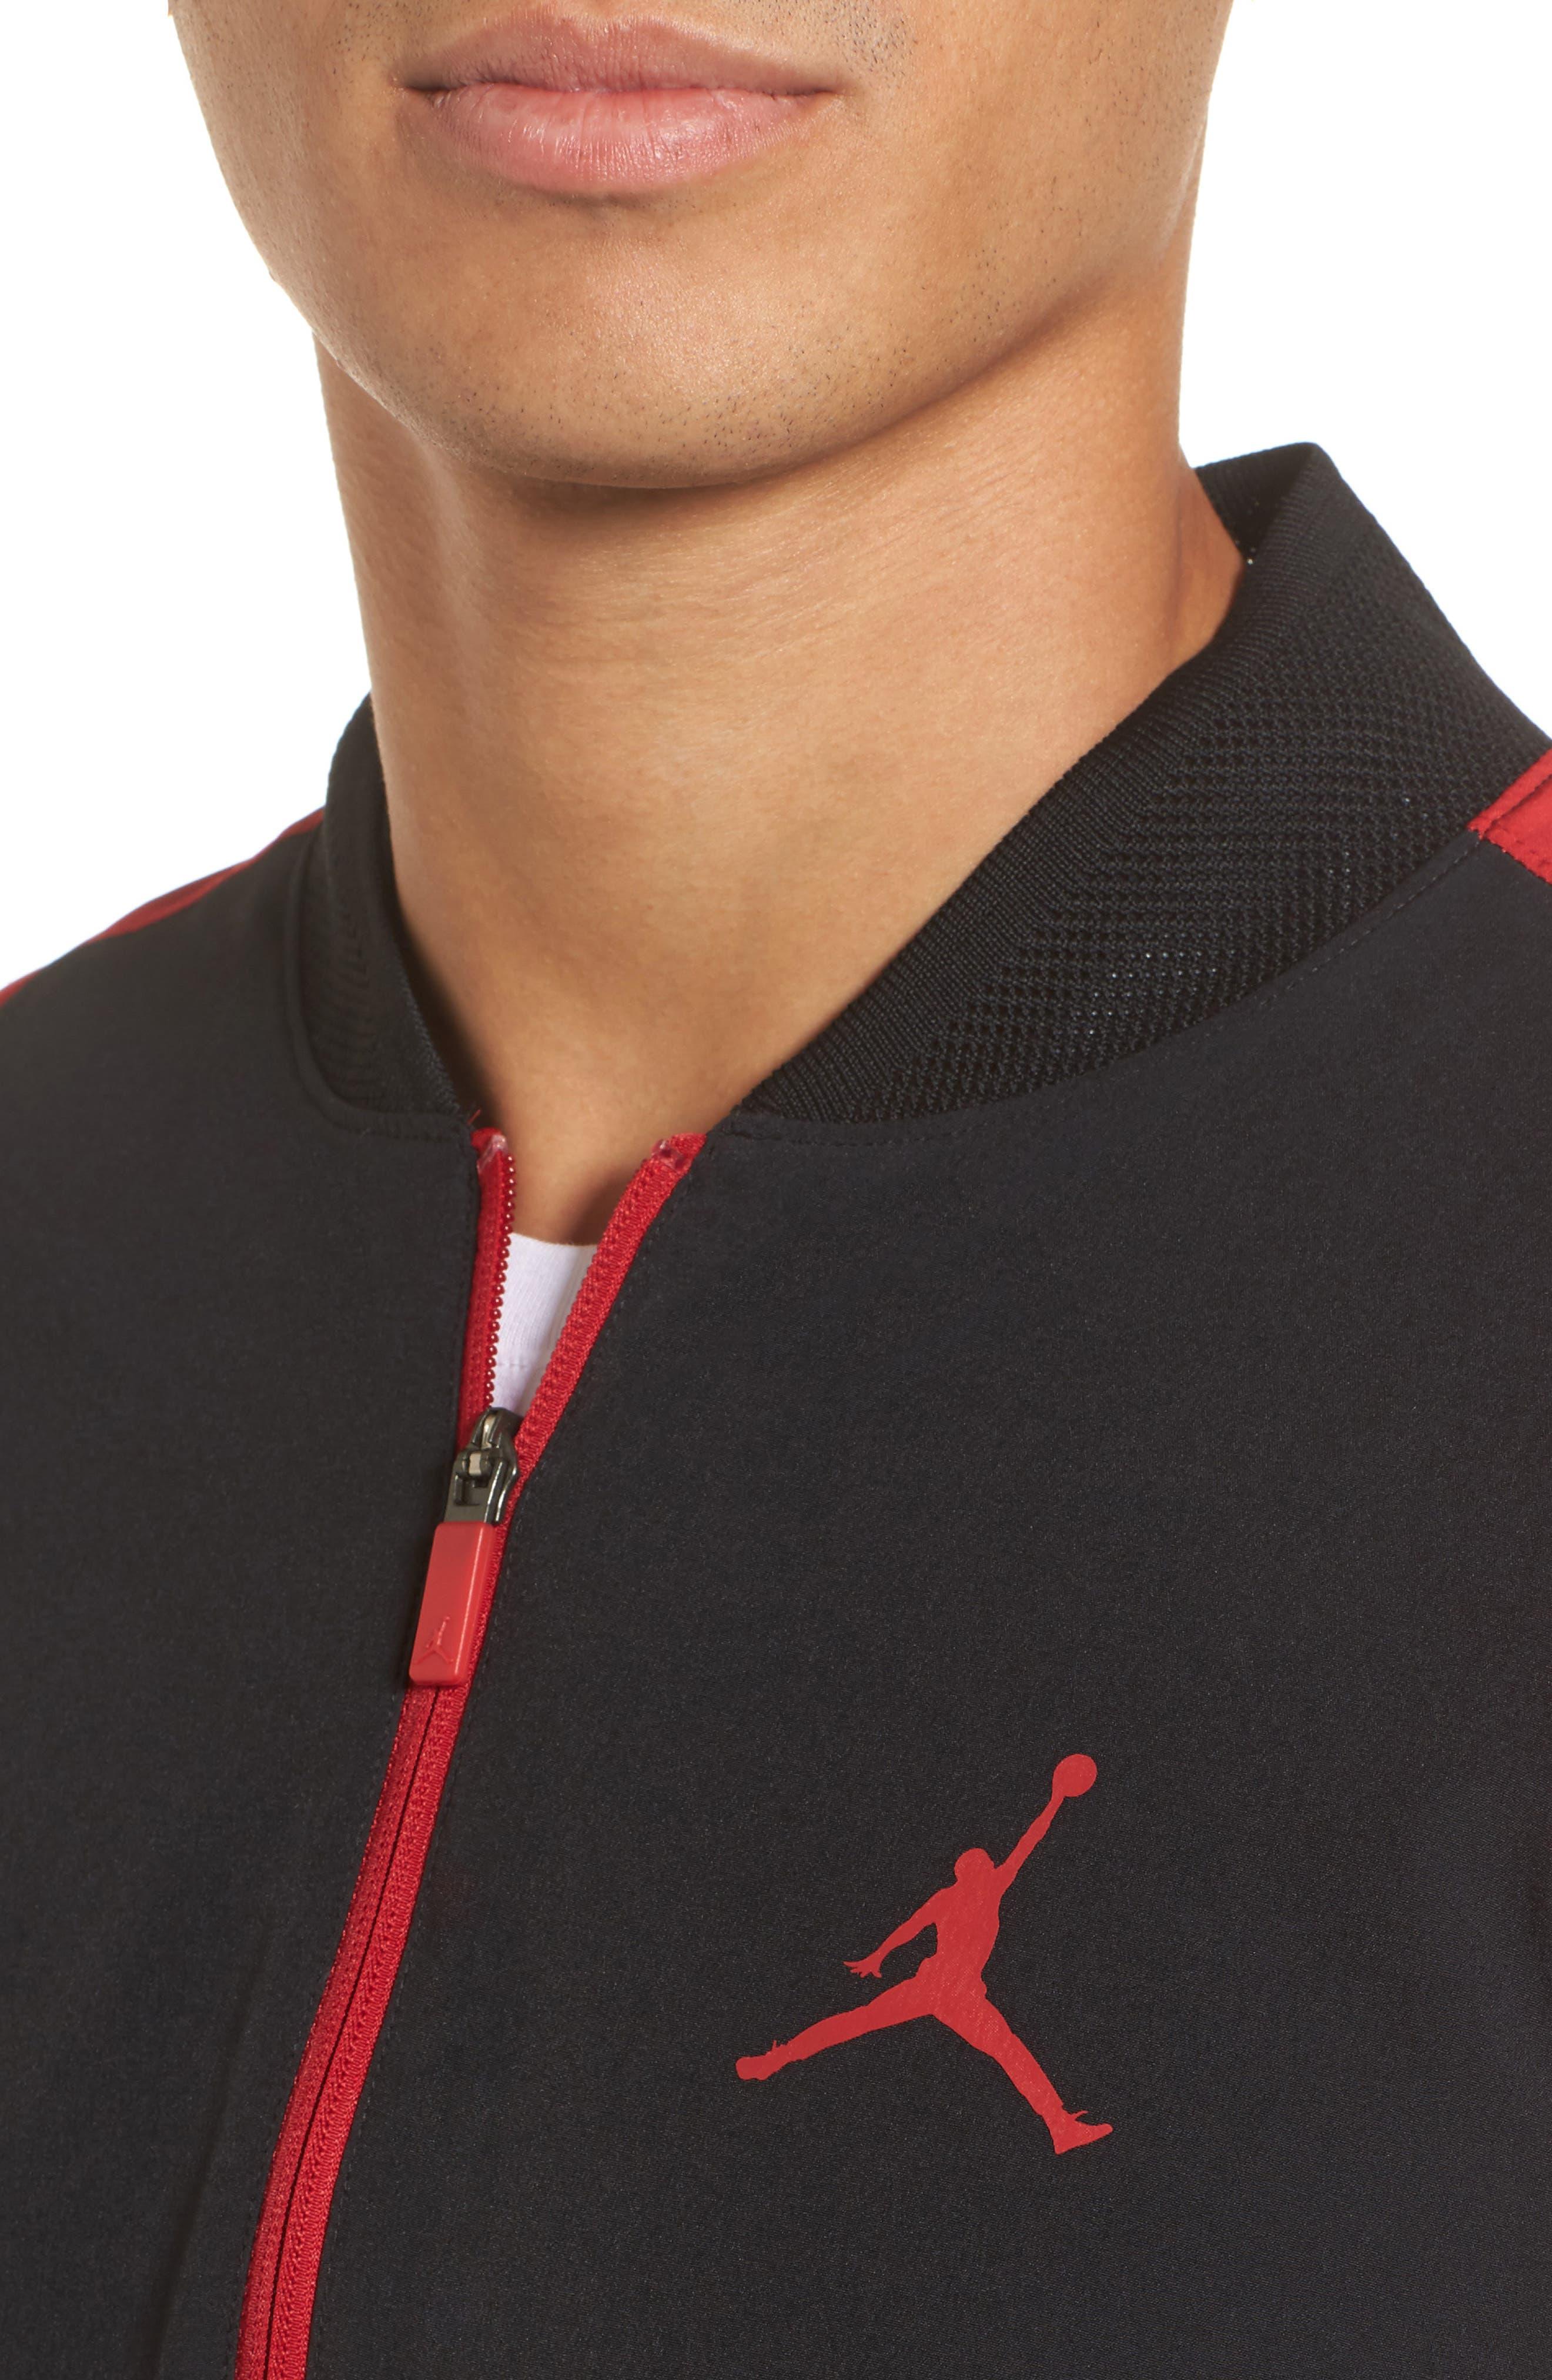 Ultimate Flight Zip Jacket,                             Alternate thumbnail 4, color,                             Black/ Gym Red